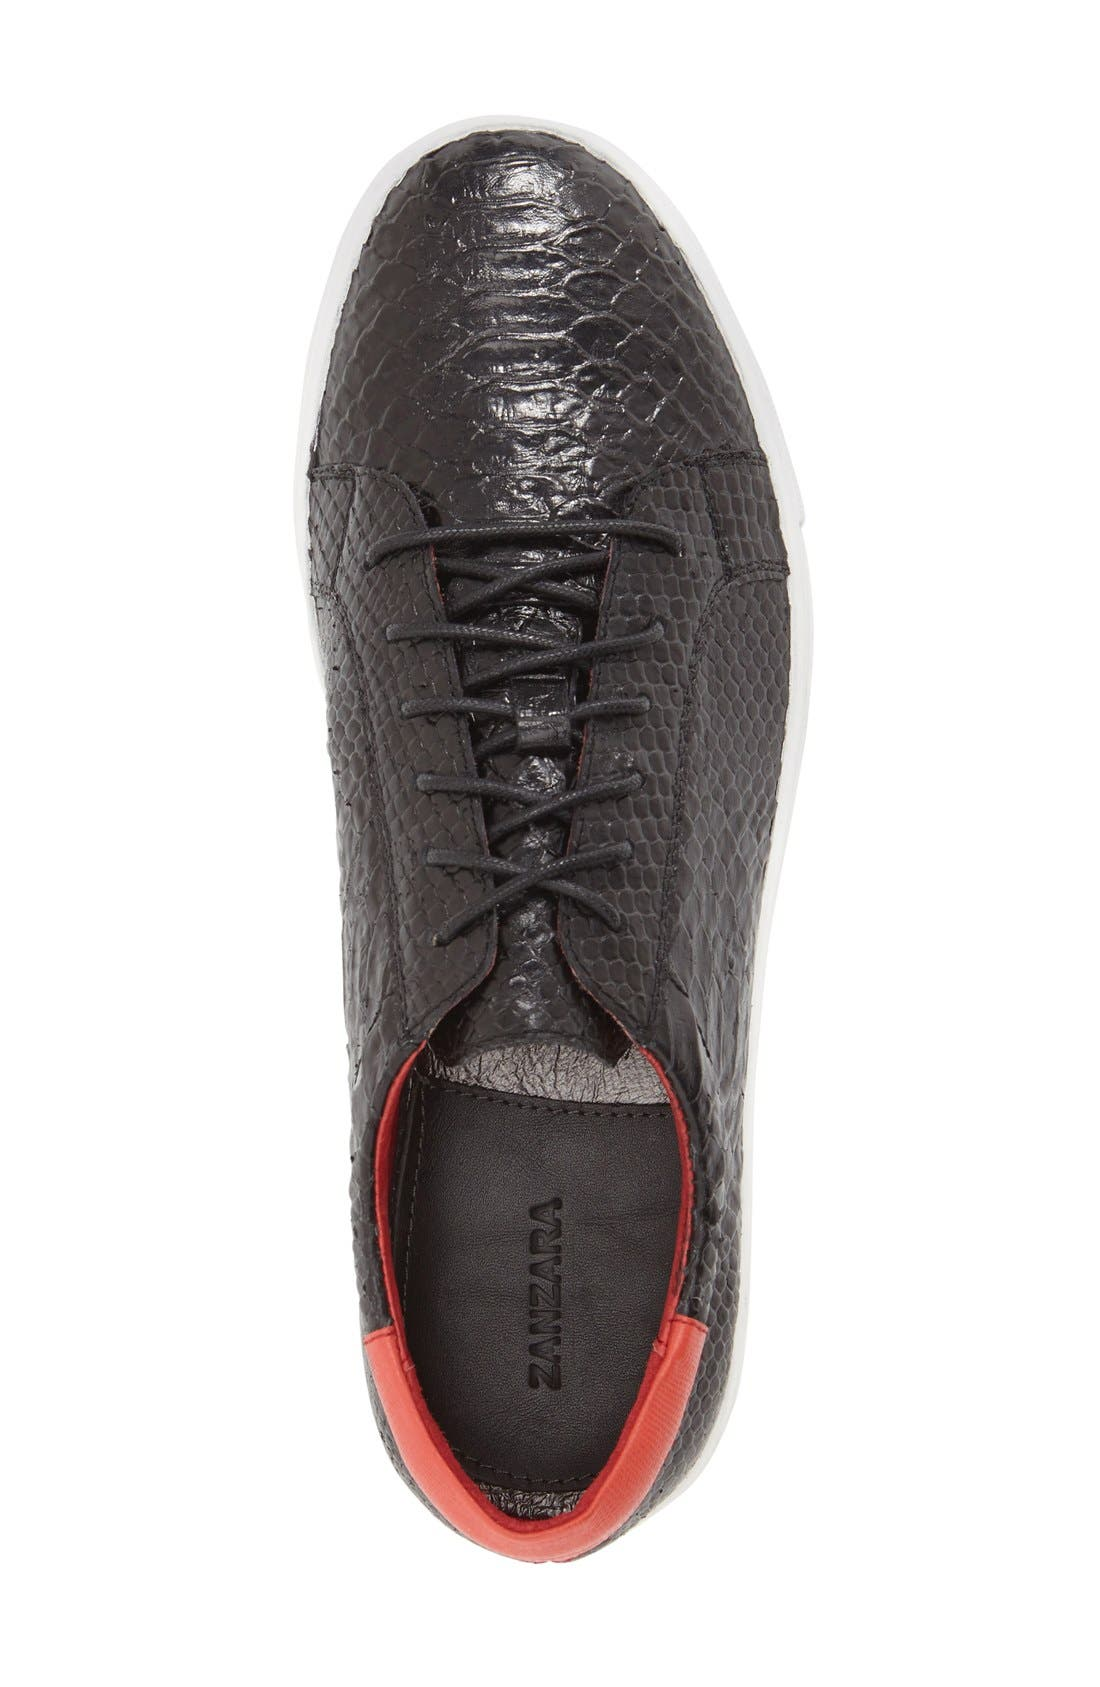 Alternate Image 3  - Zanzara 'Riff' Sneaker (Men)